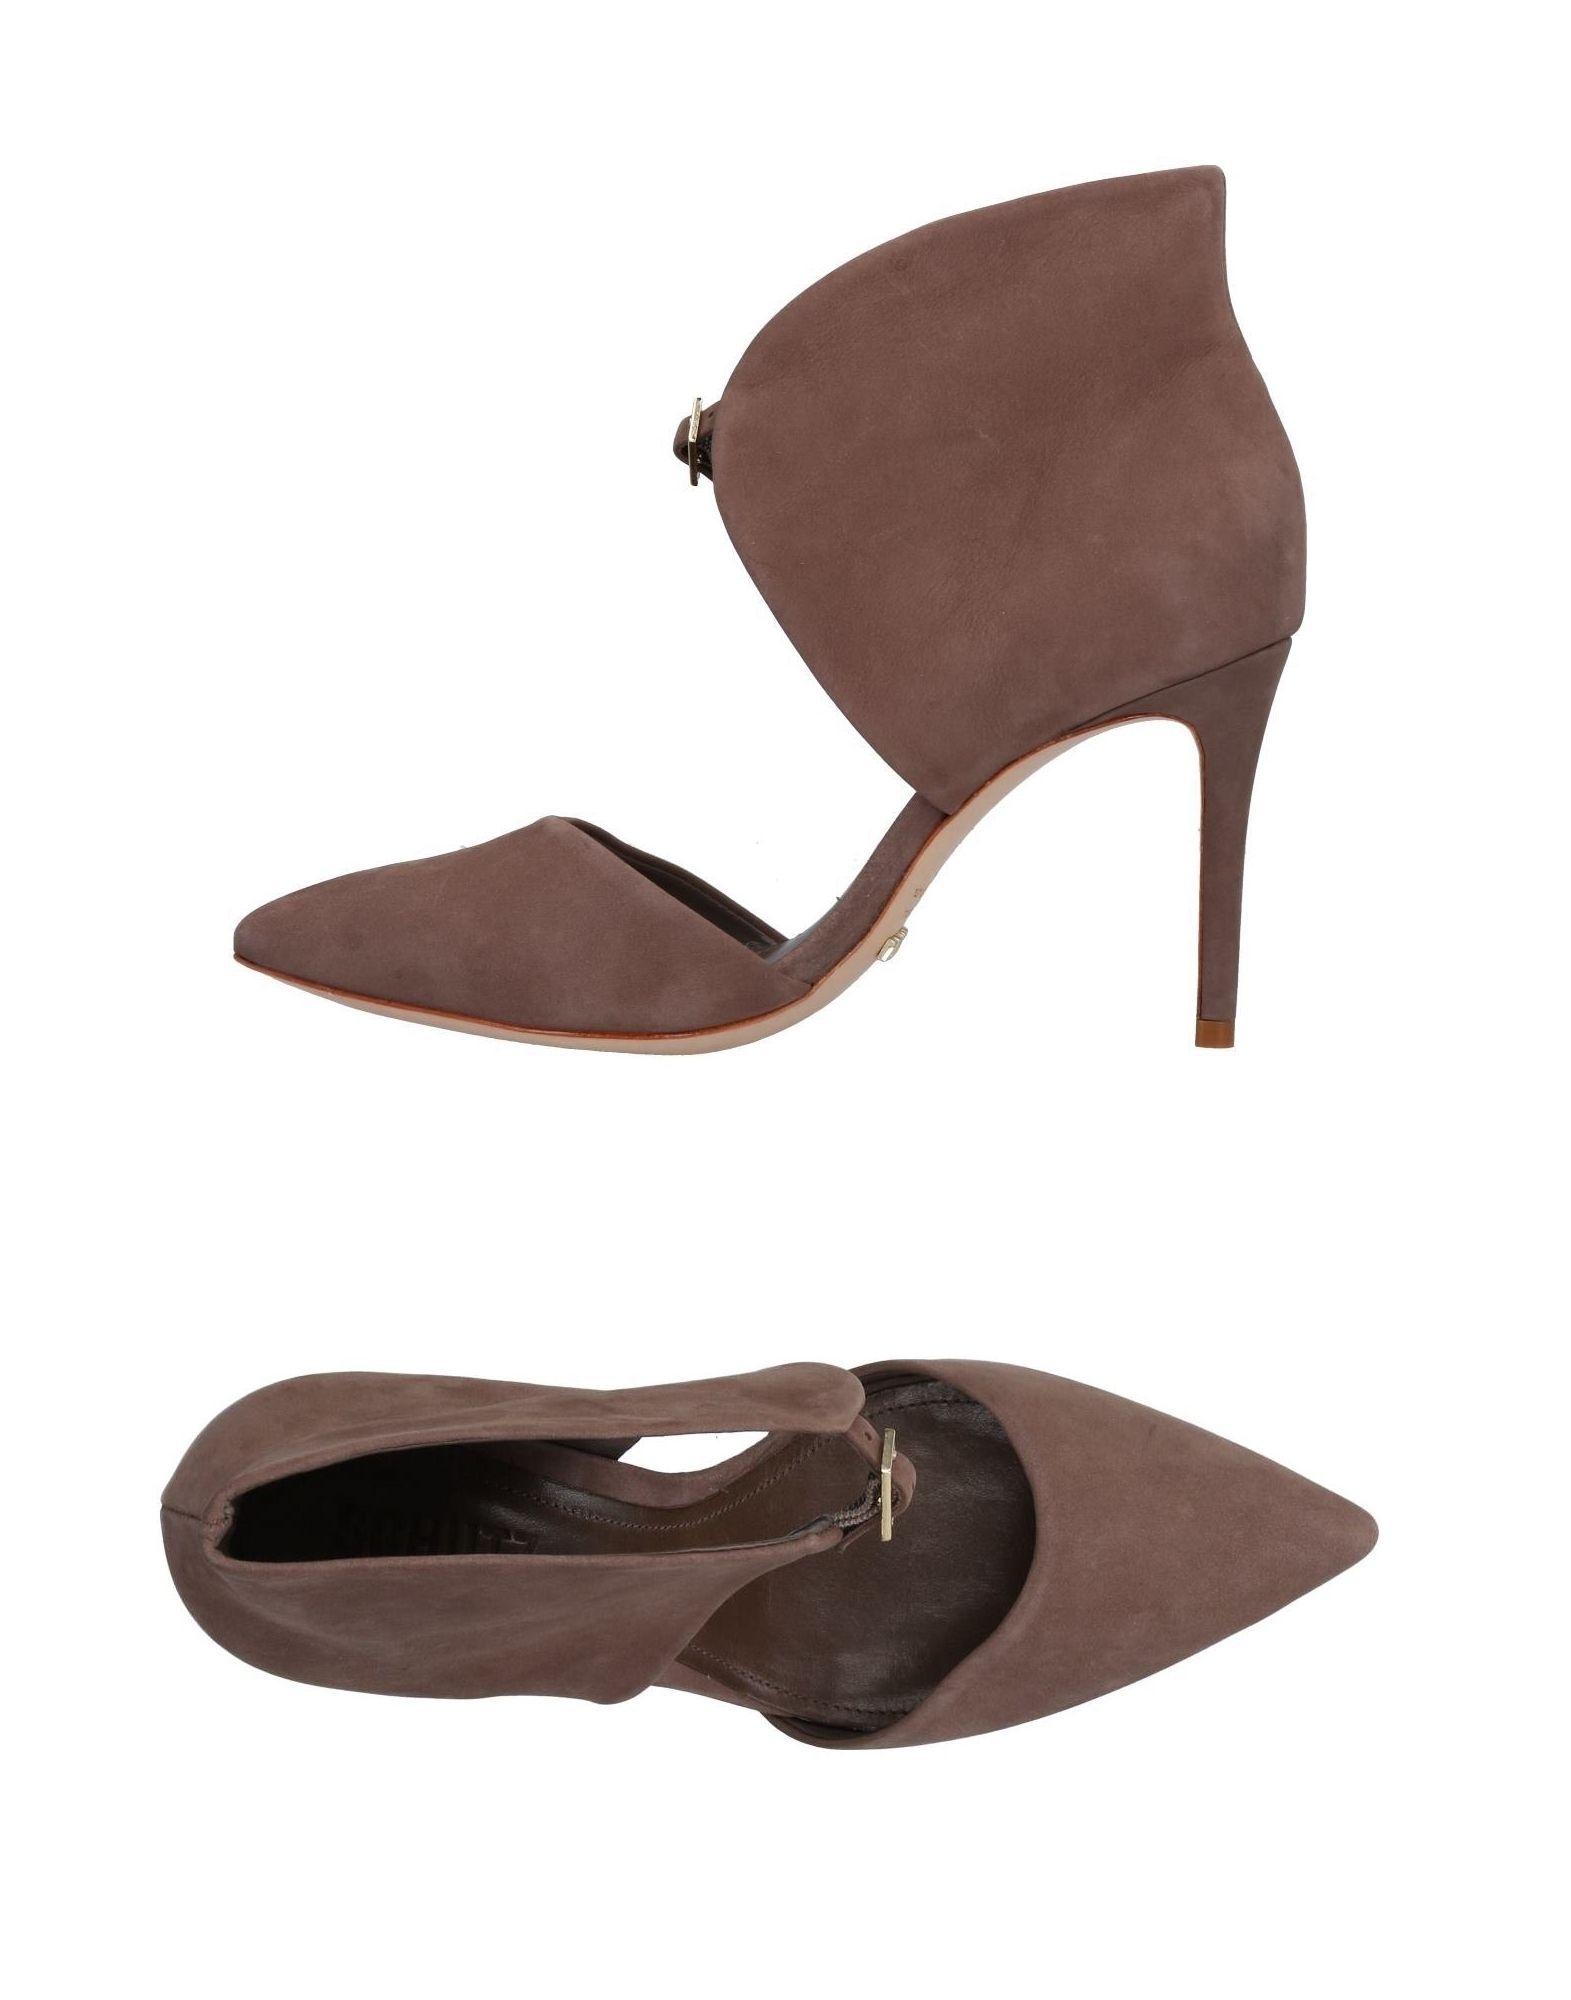 Sandali Sara offerte Donna - 11460460OA Nuove offerte Sara e scarpe comode 4ee701